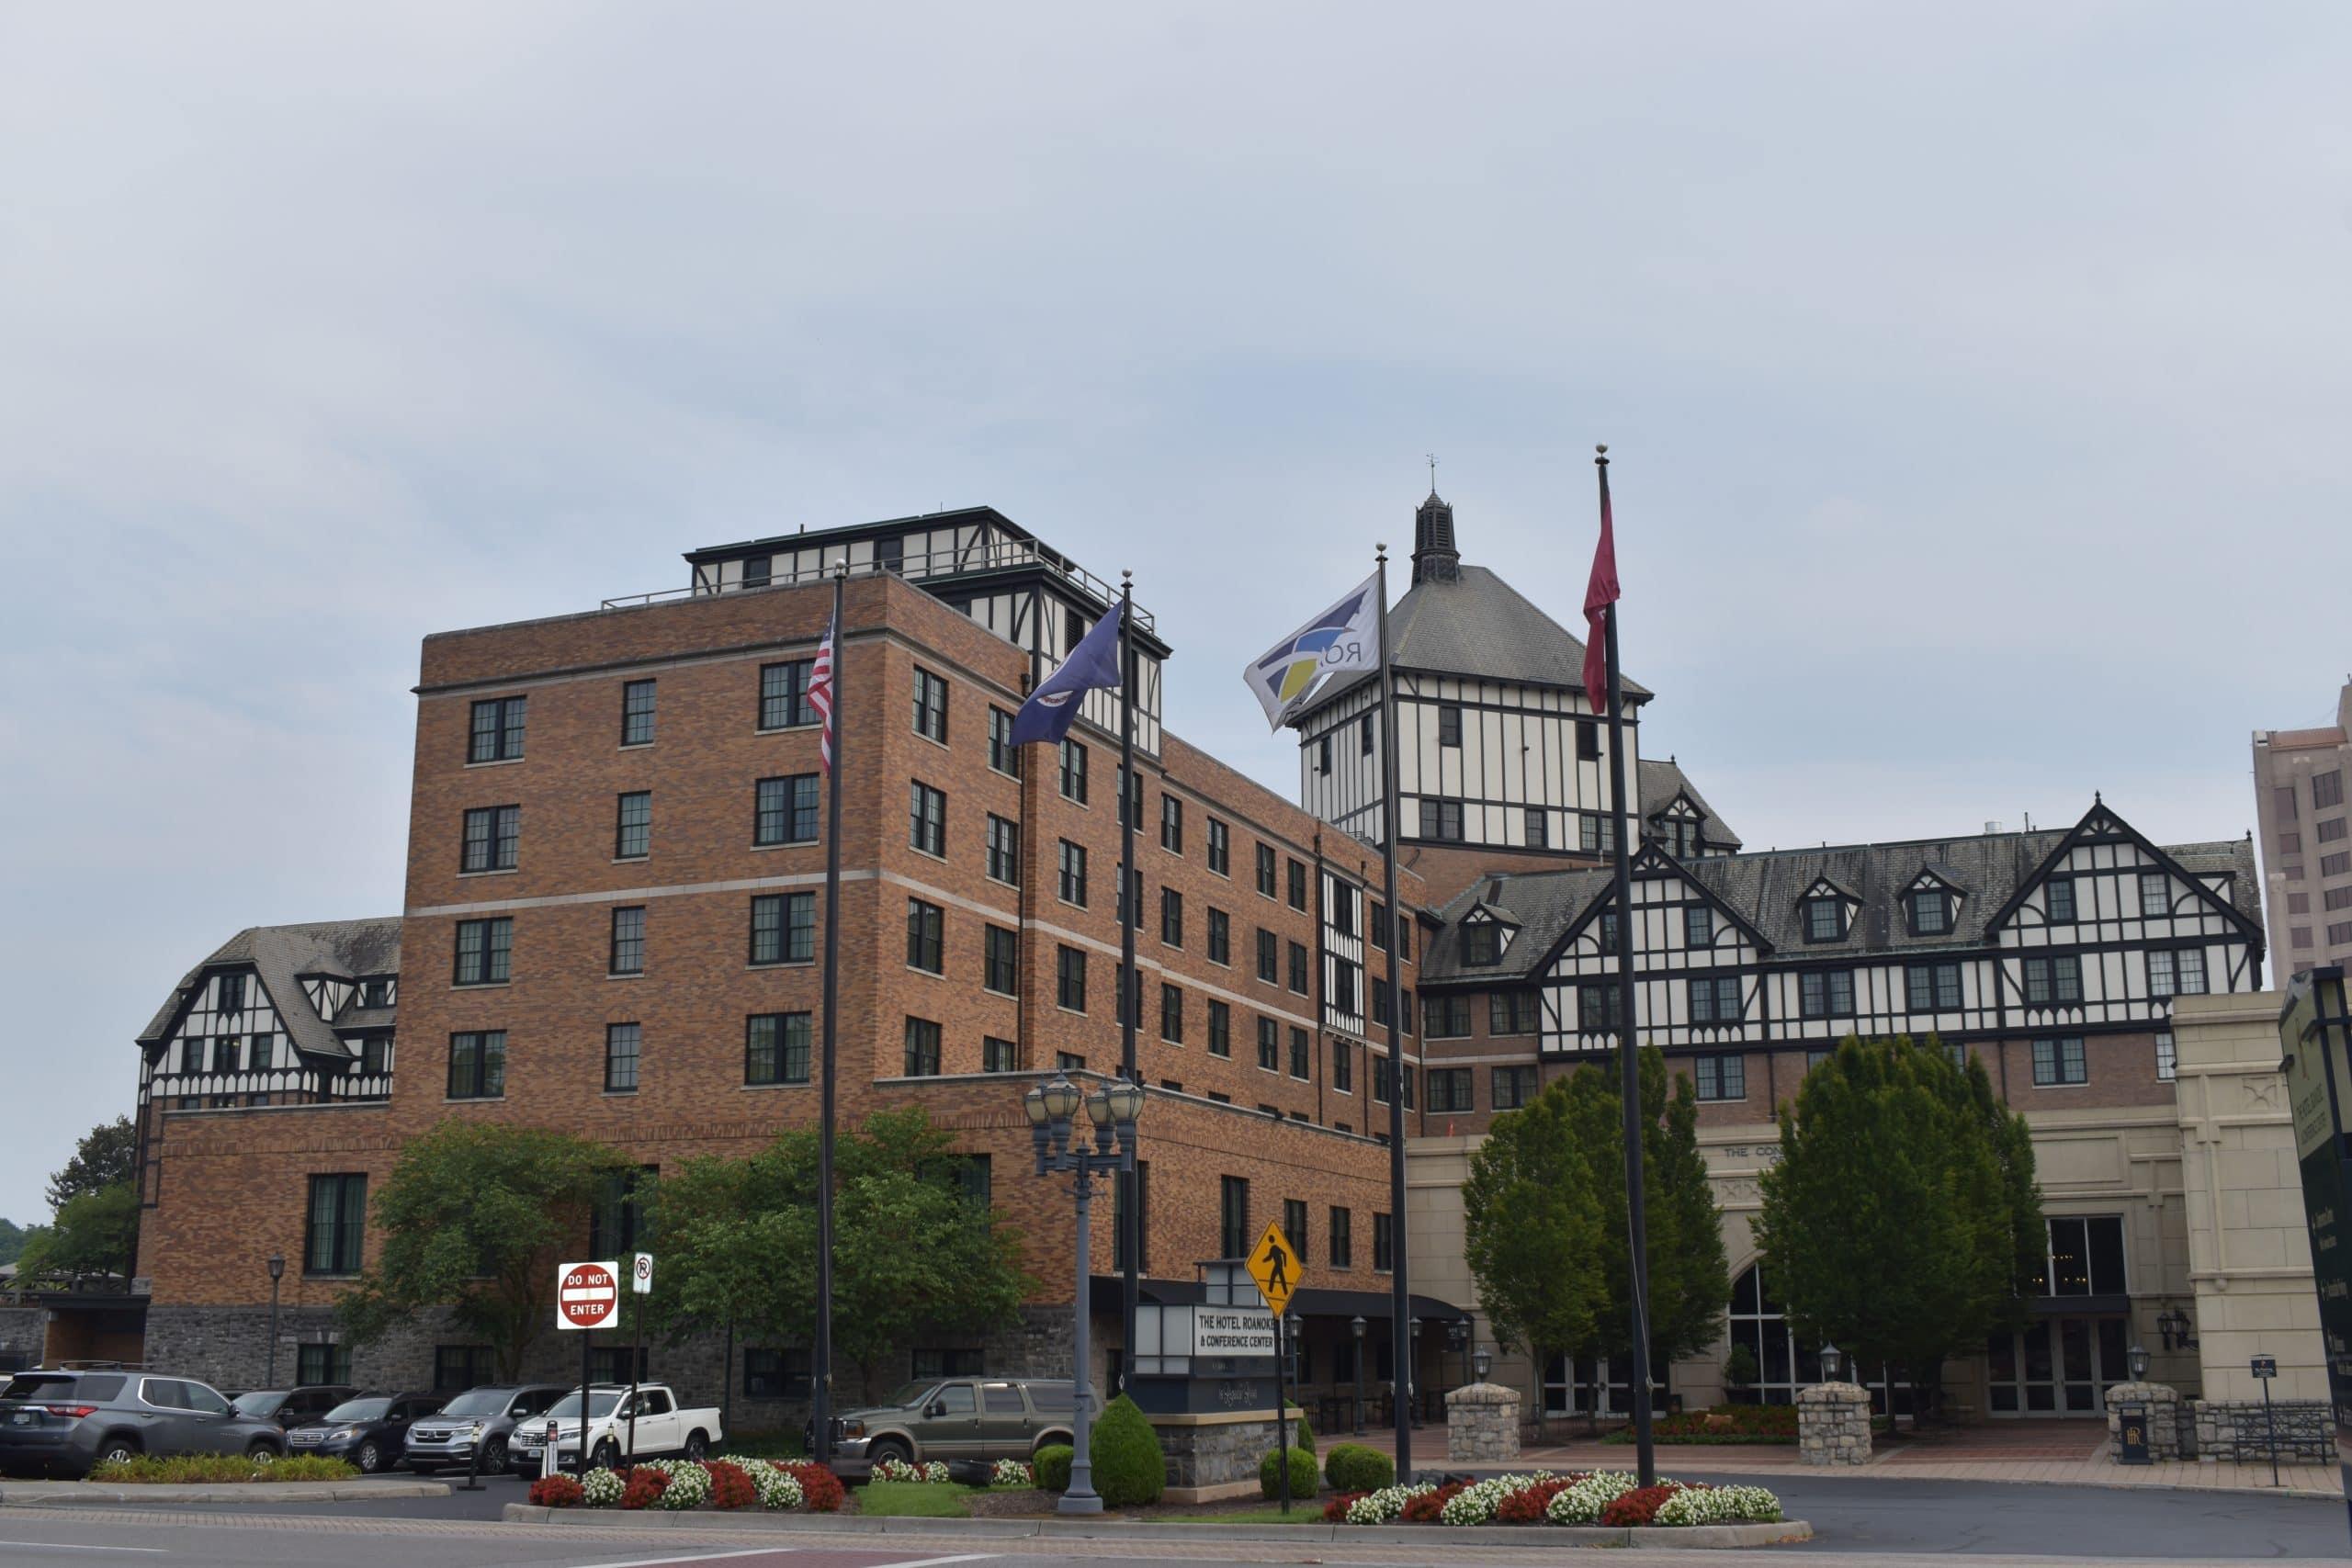 Roanoke Hotel scaled